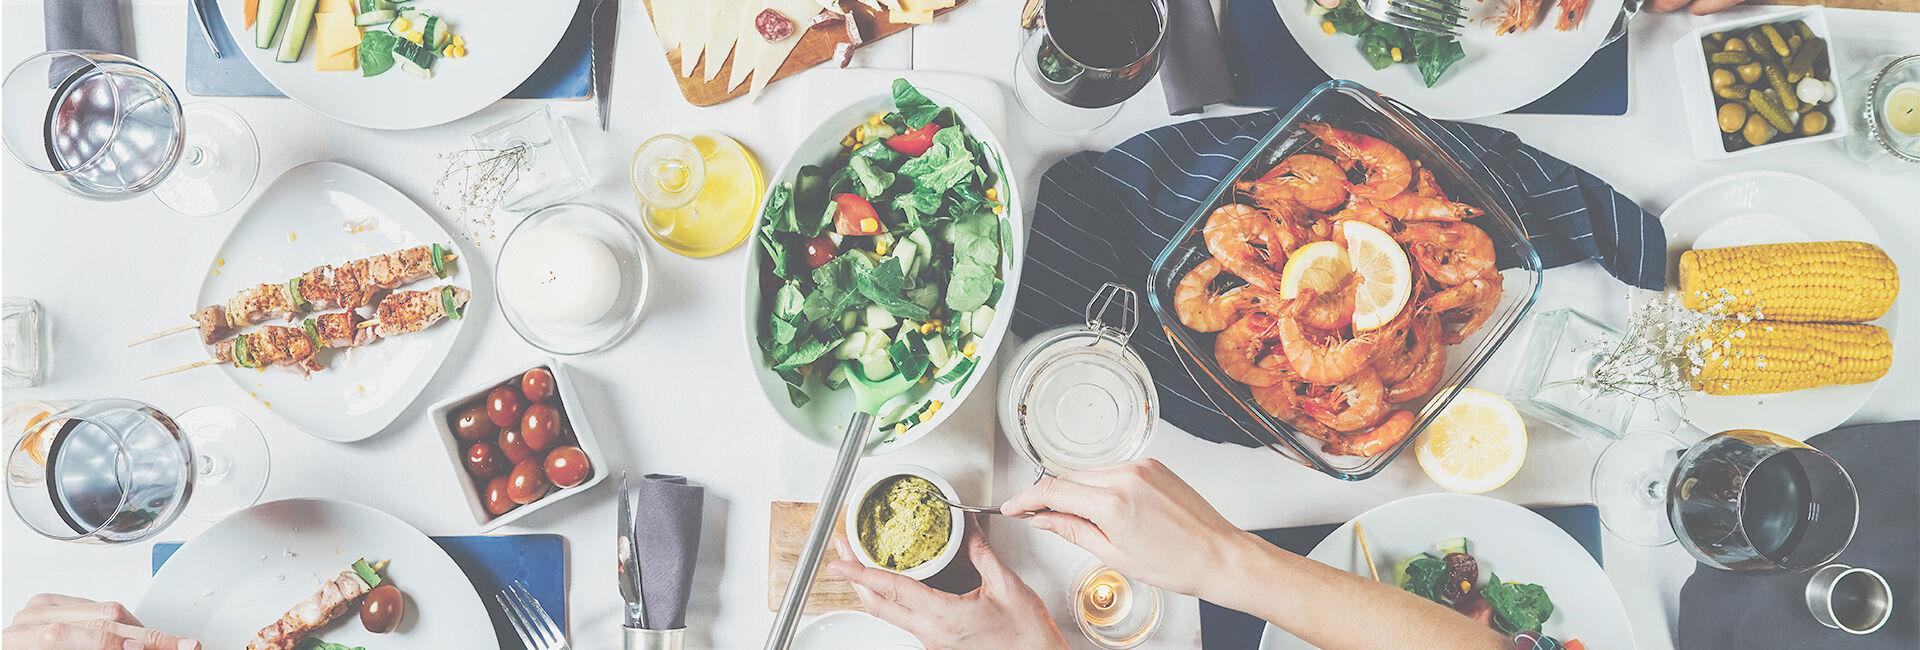 Blueair  cooking-odors-banner